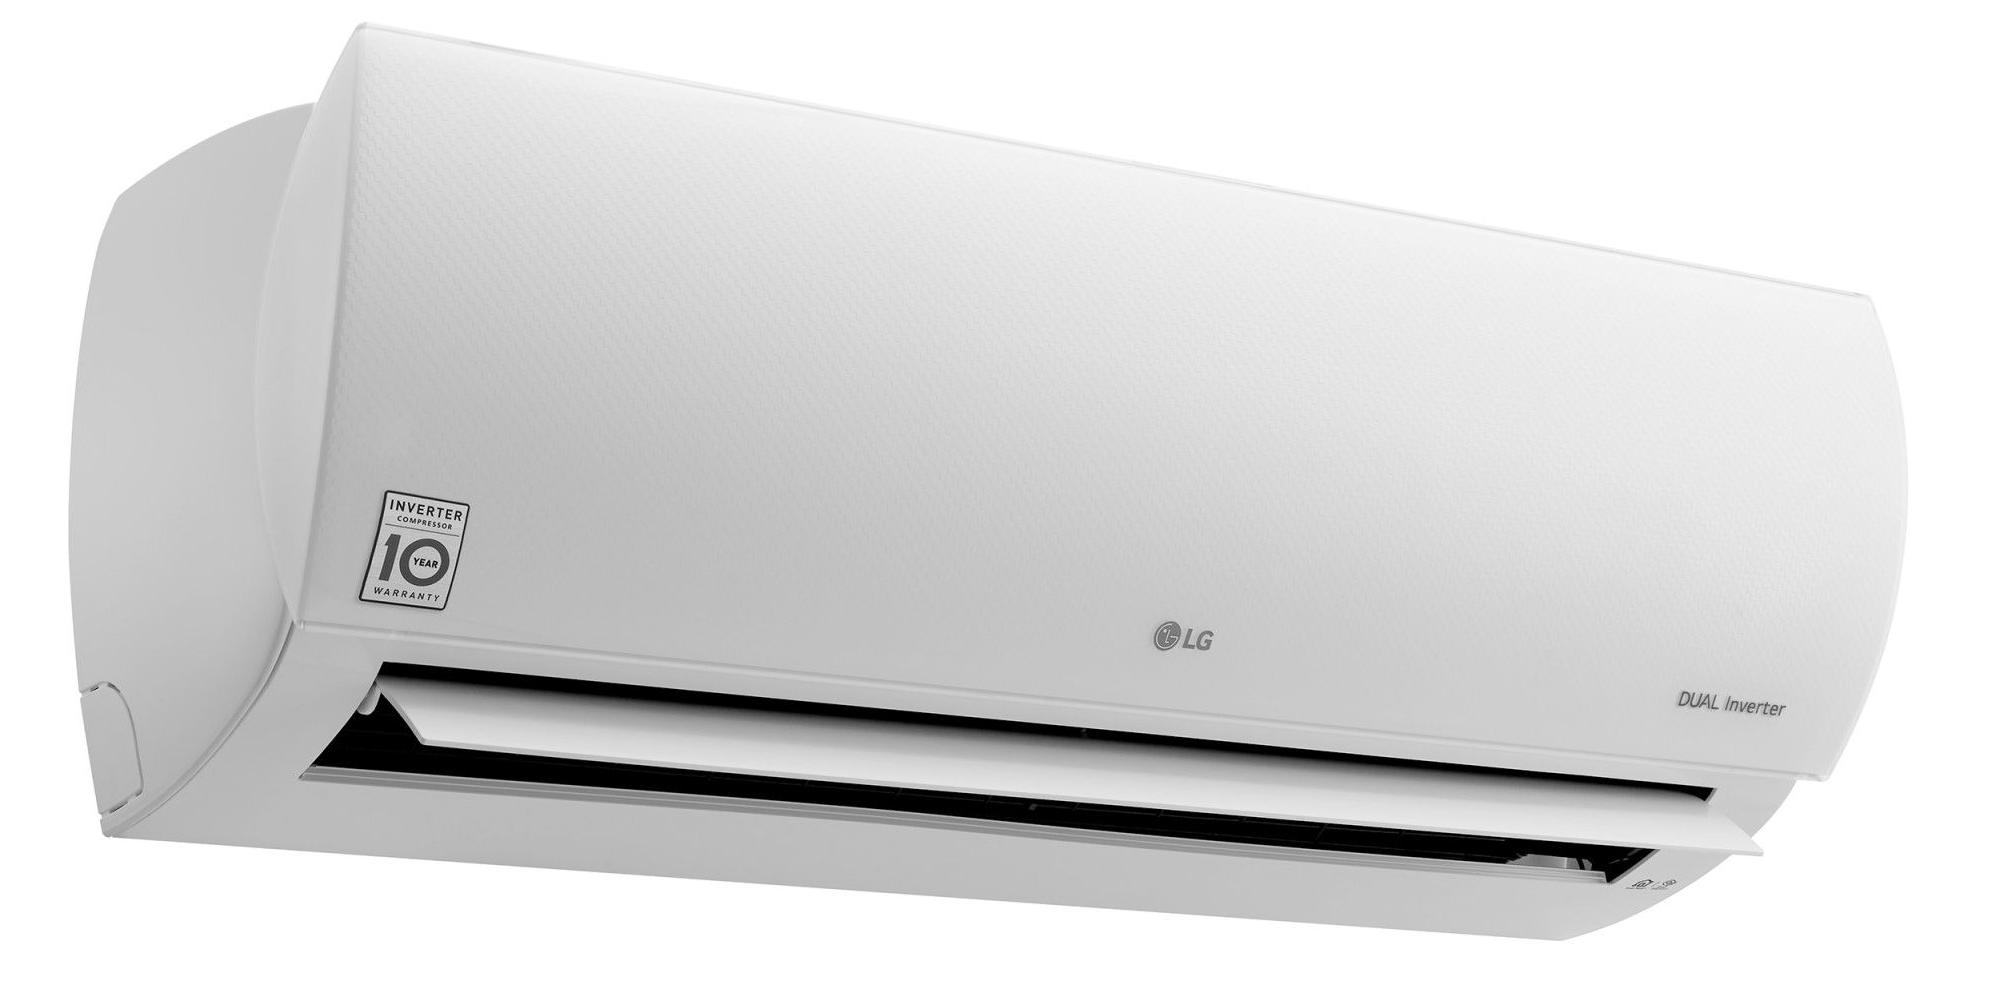 LG Prestige Dual Inverter H12AP